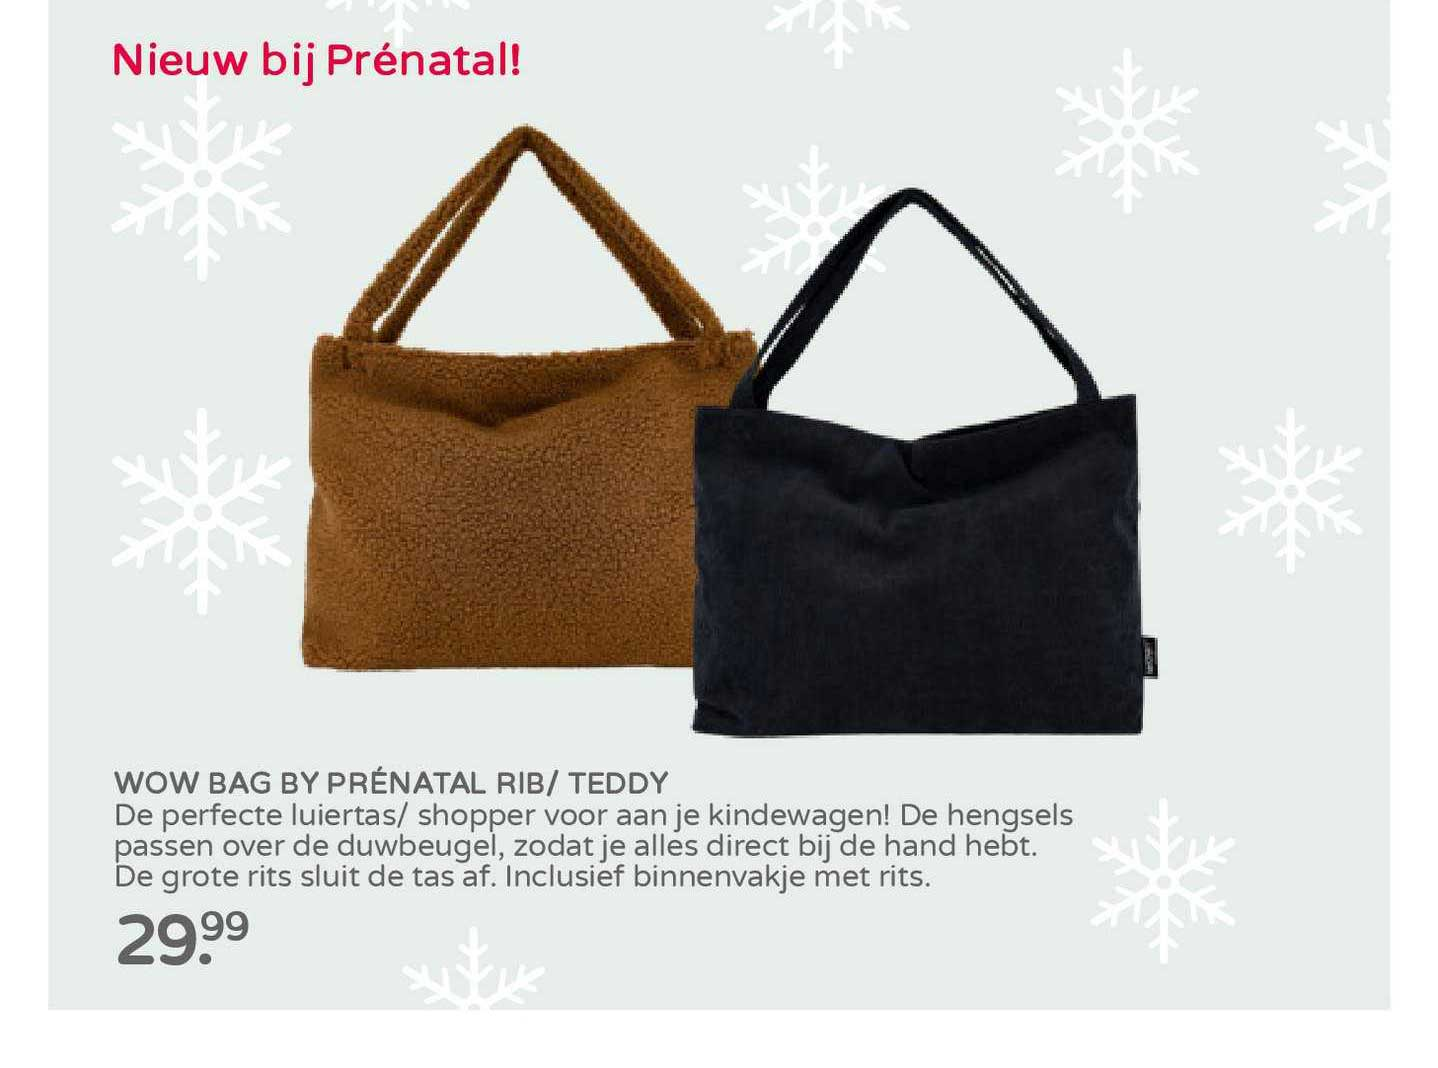 Prénatal Wow Bag By Prenatal Rib-Teddy